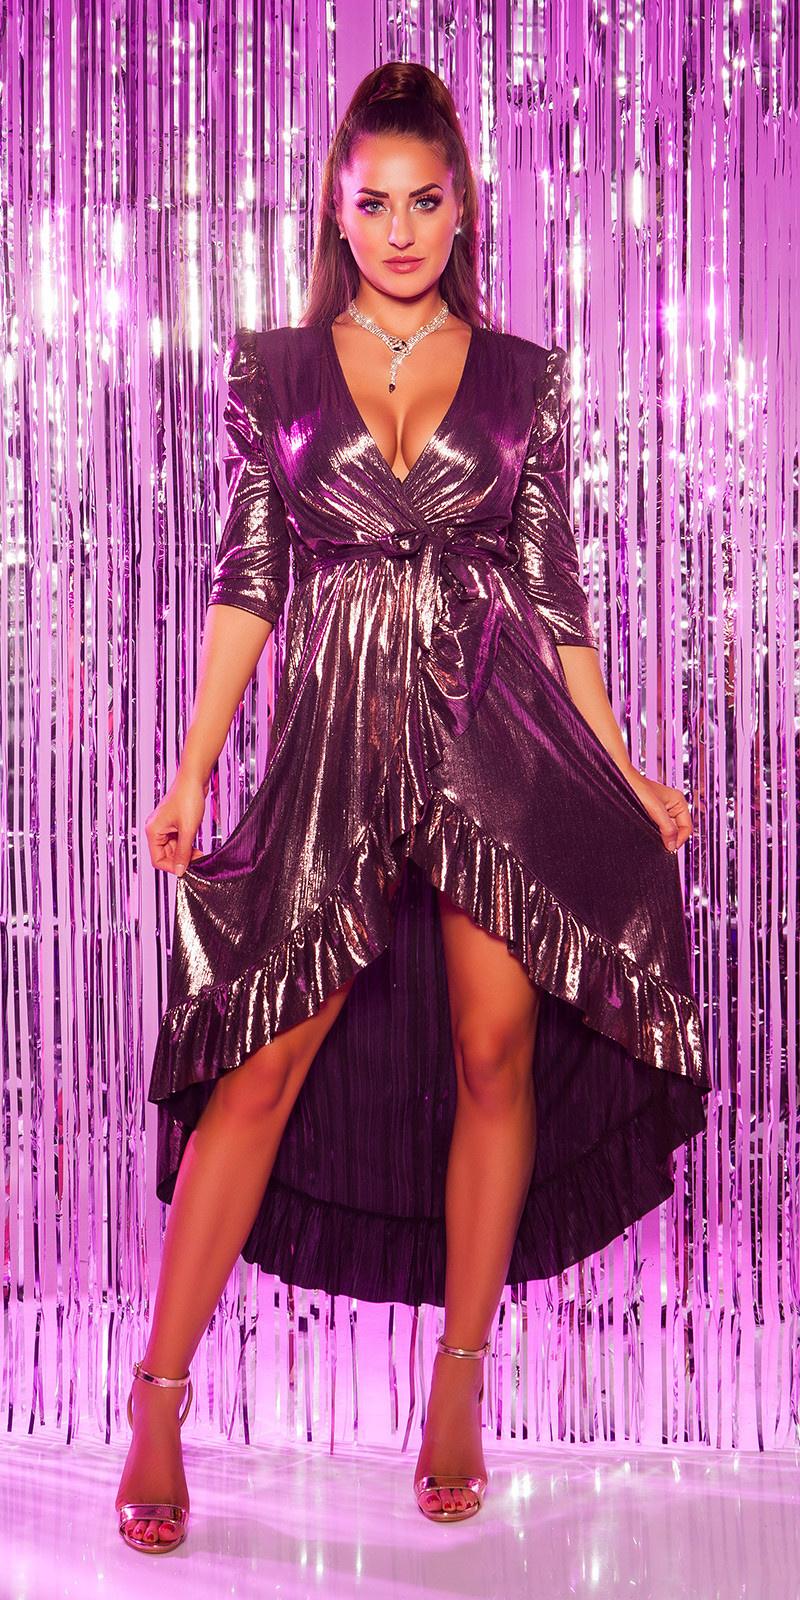 Sexy feest uitgaans jurk 3/4 mouwen wikkel look paars